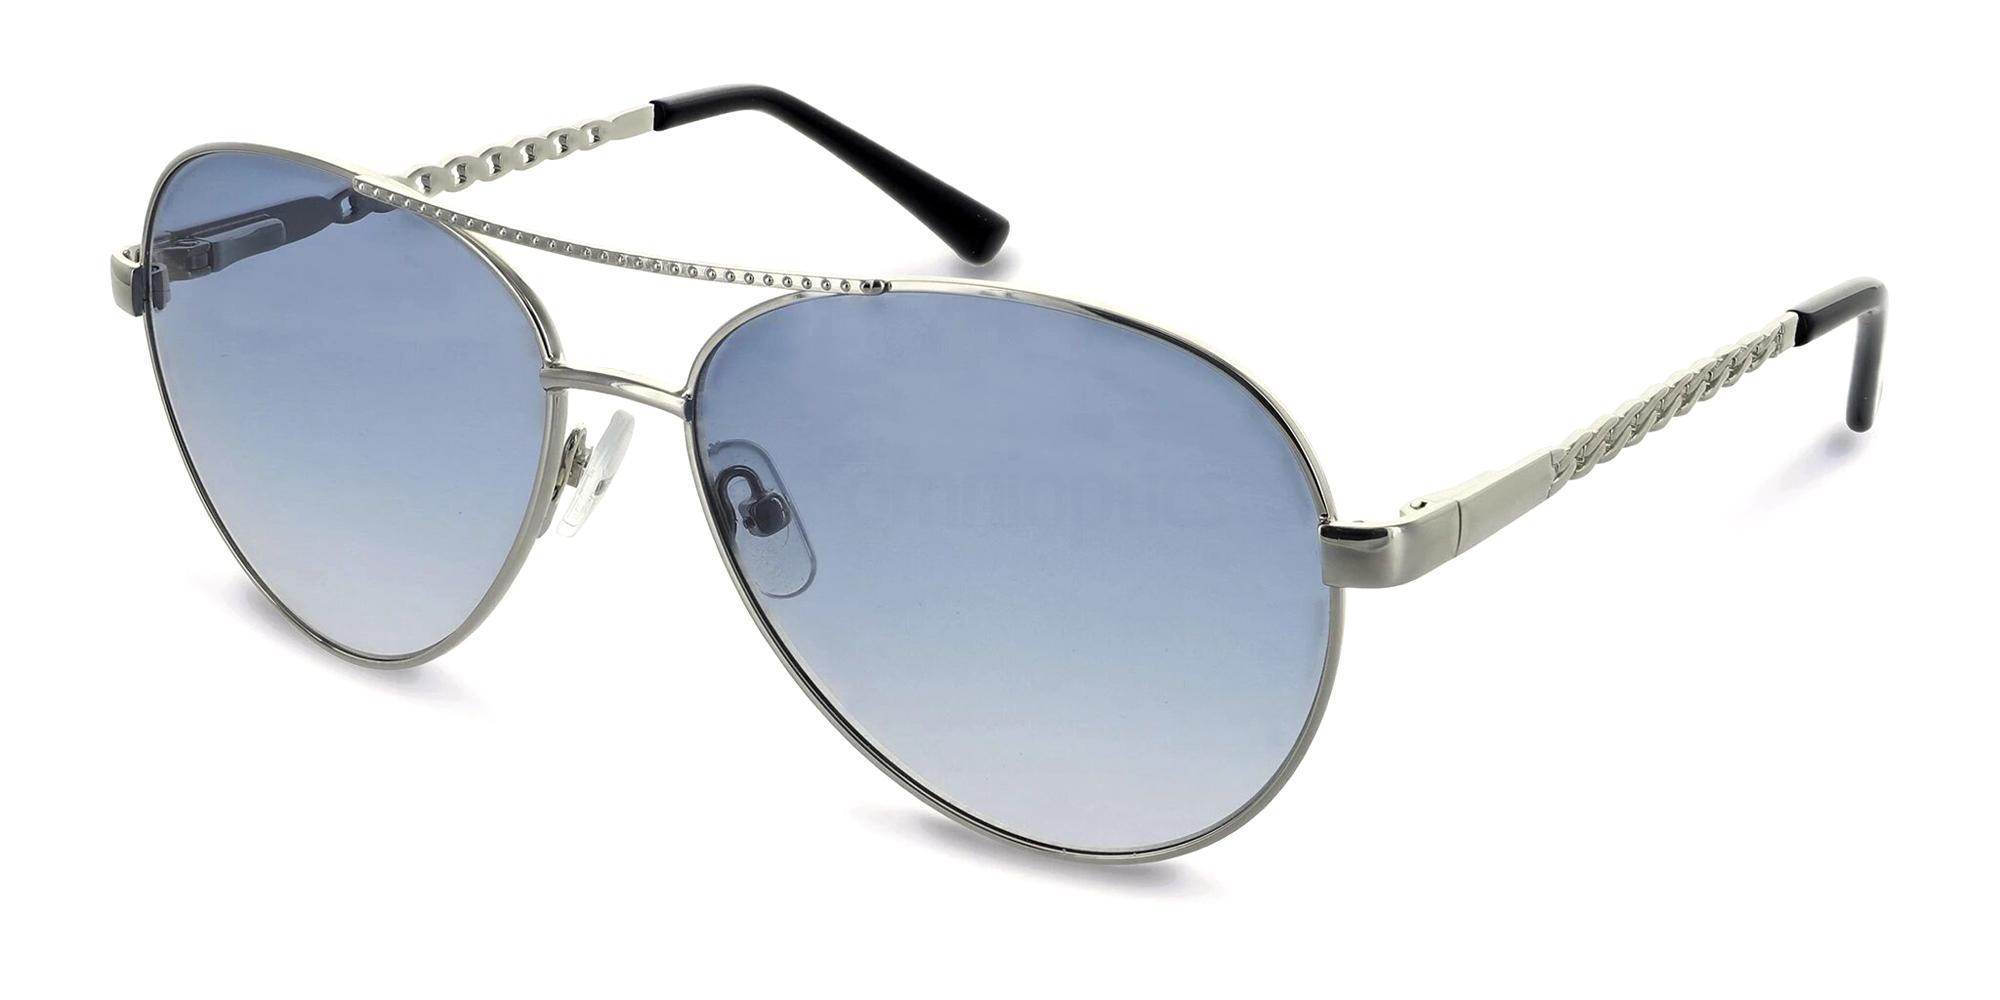 C2 LS007 Sunglasses, LAZER